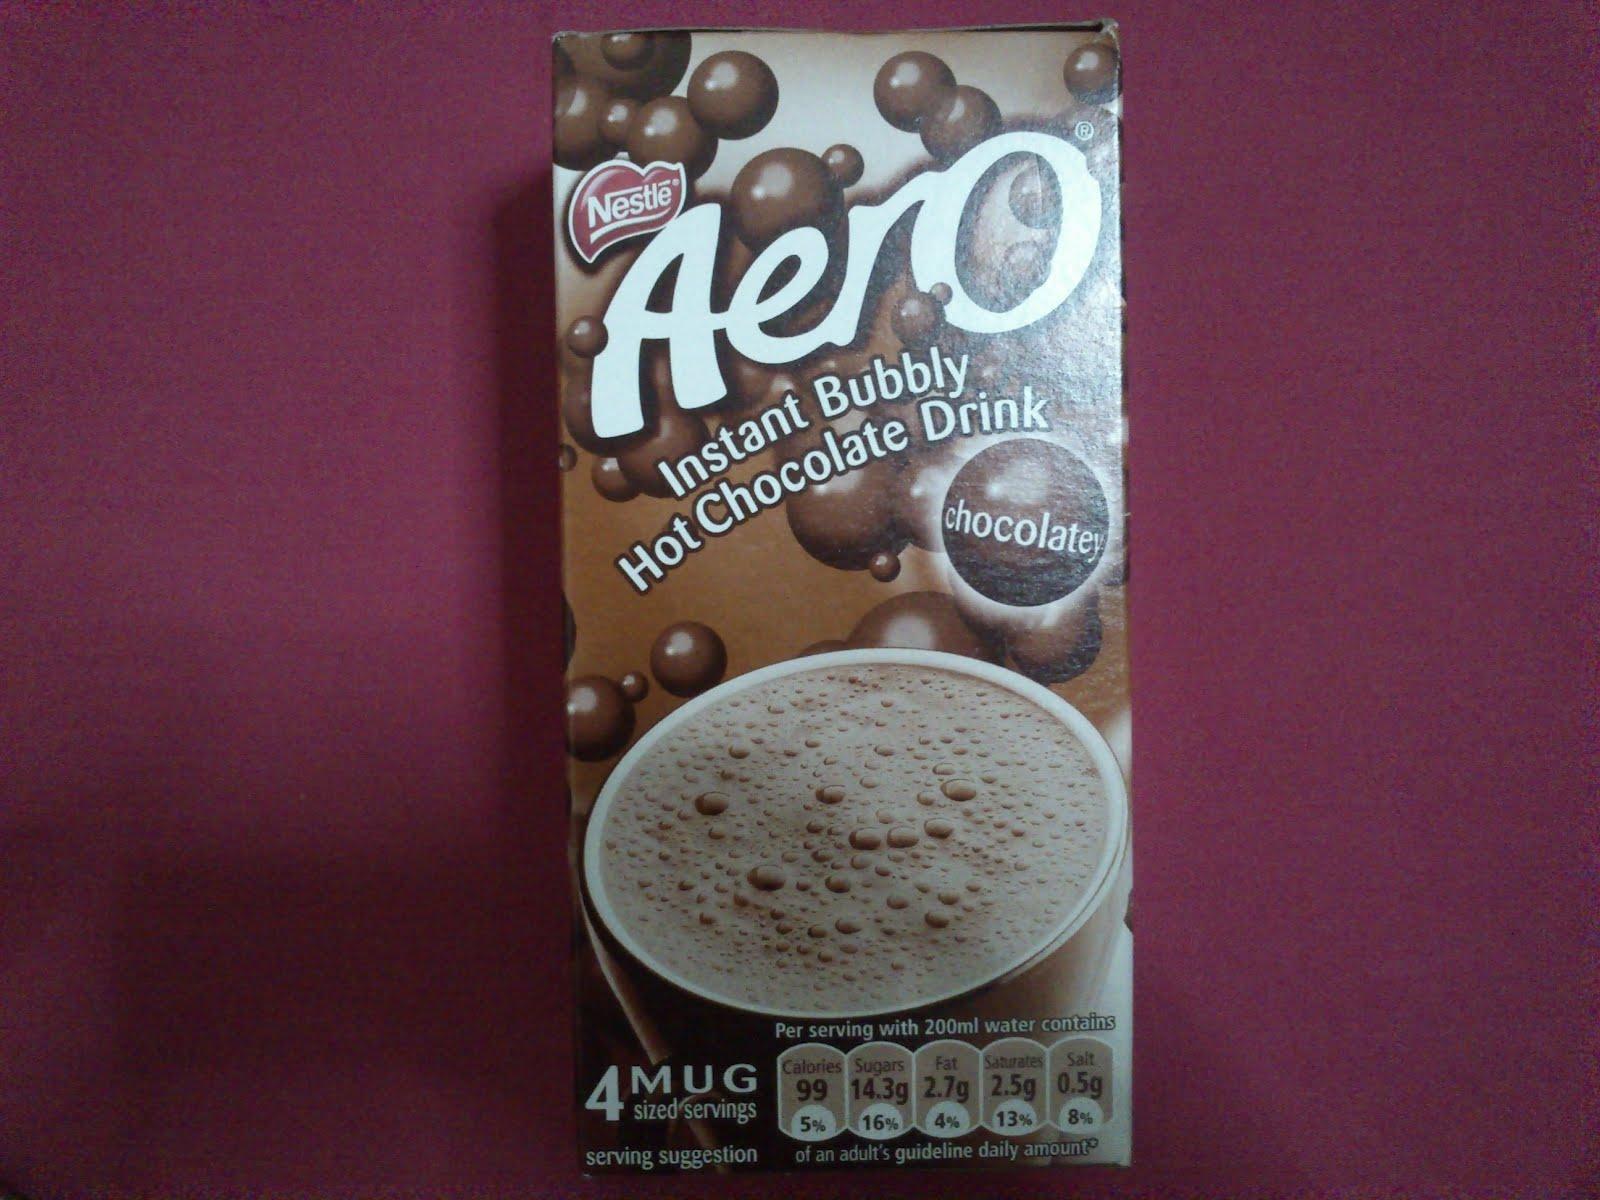 My Hot Cocoa Aero Instant Bubbly Hot Chocolate Drink